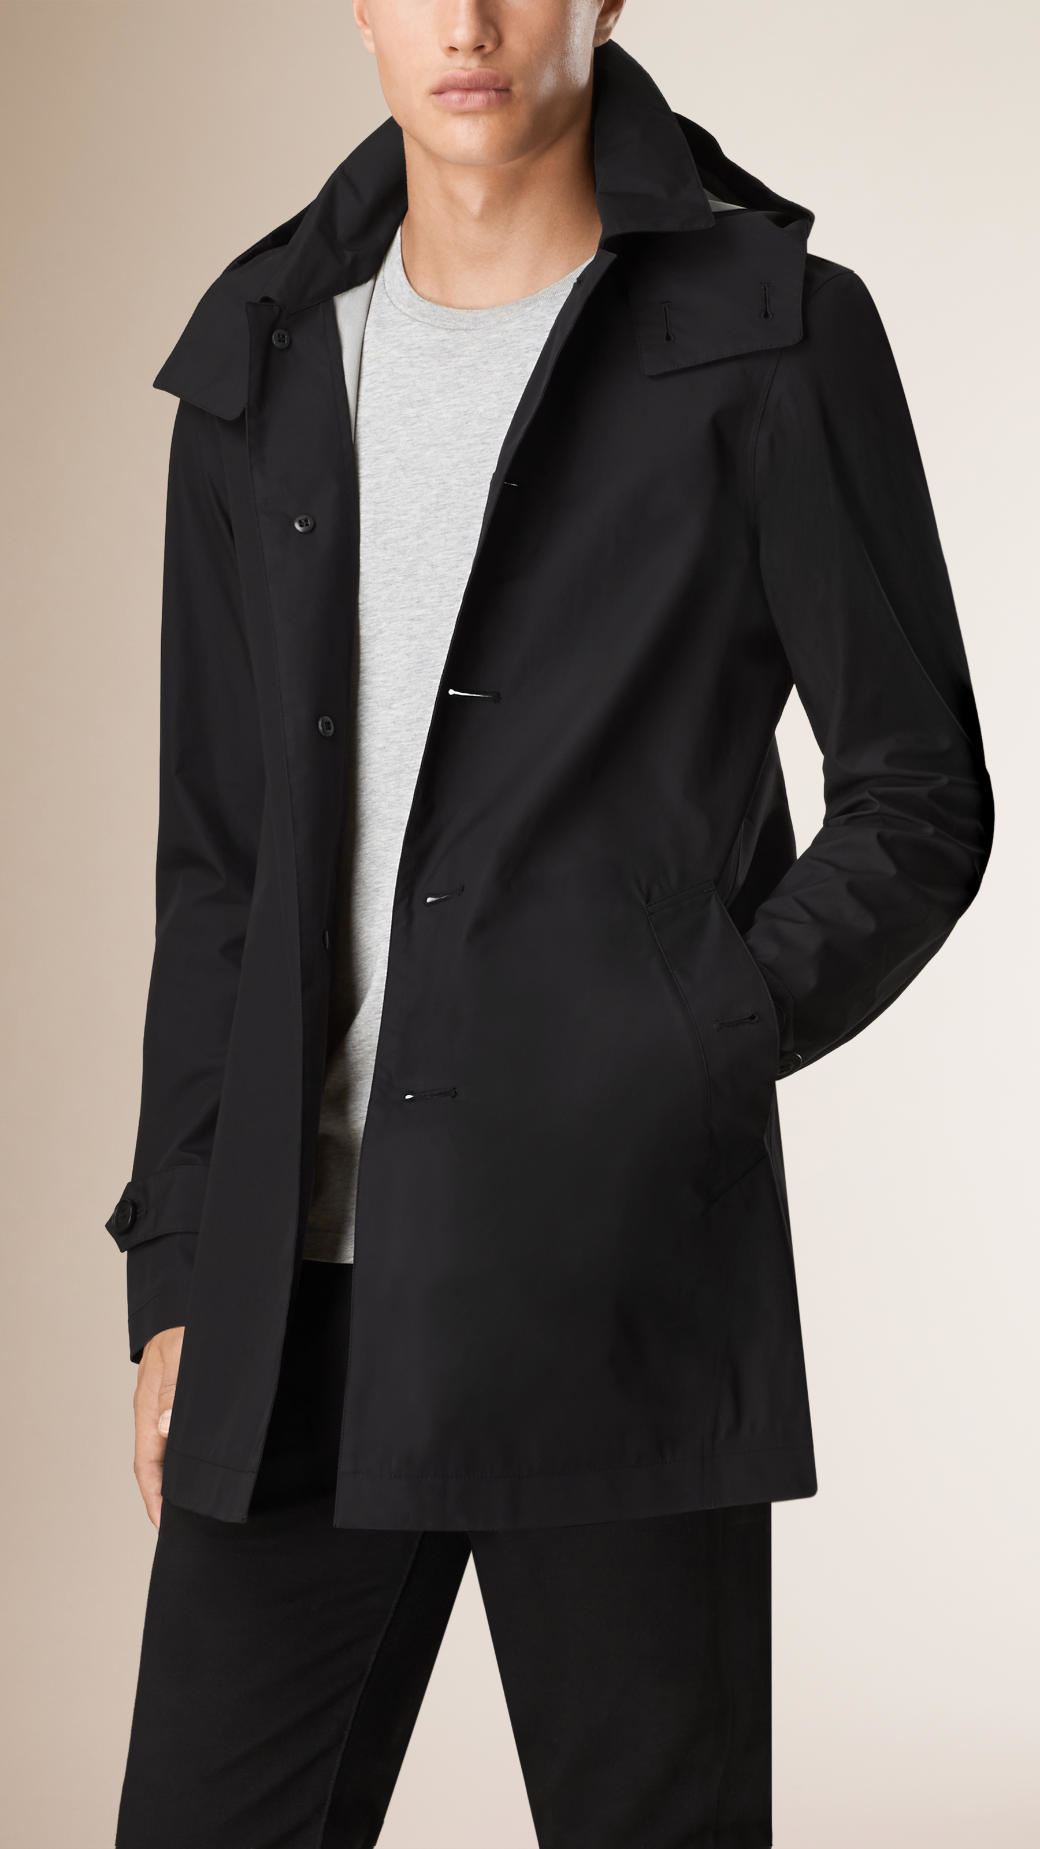 Burberry Lightweight Cotton Car Coat in Black for Men | Lyst